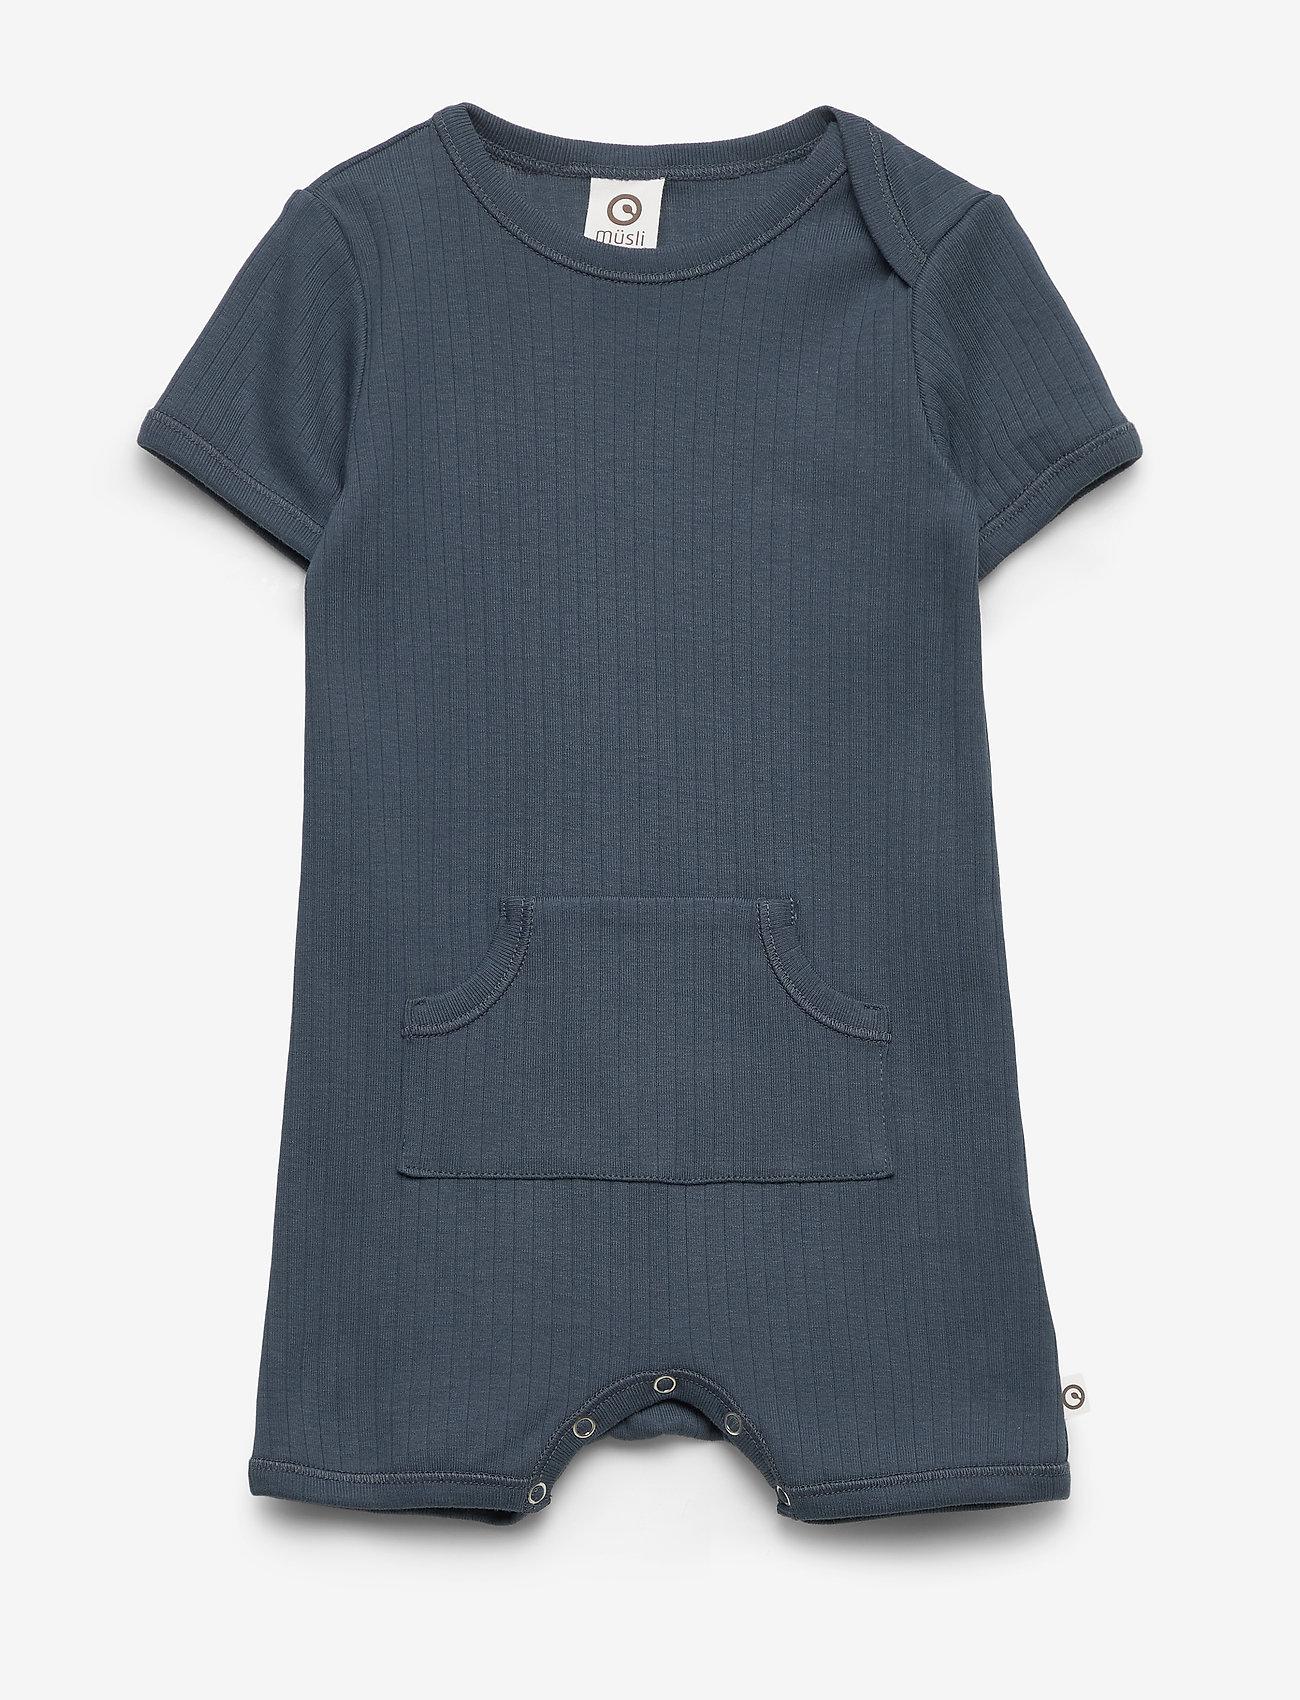 Müsli by Green Cotton - Cozy pocket beach body - kurzärmelig - midnight - 0